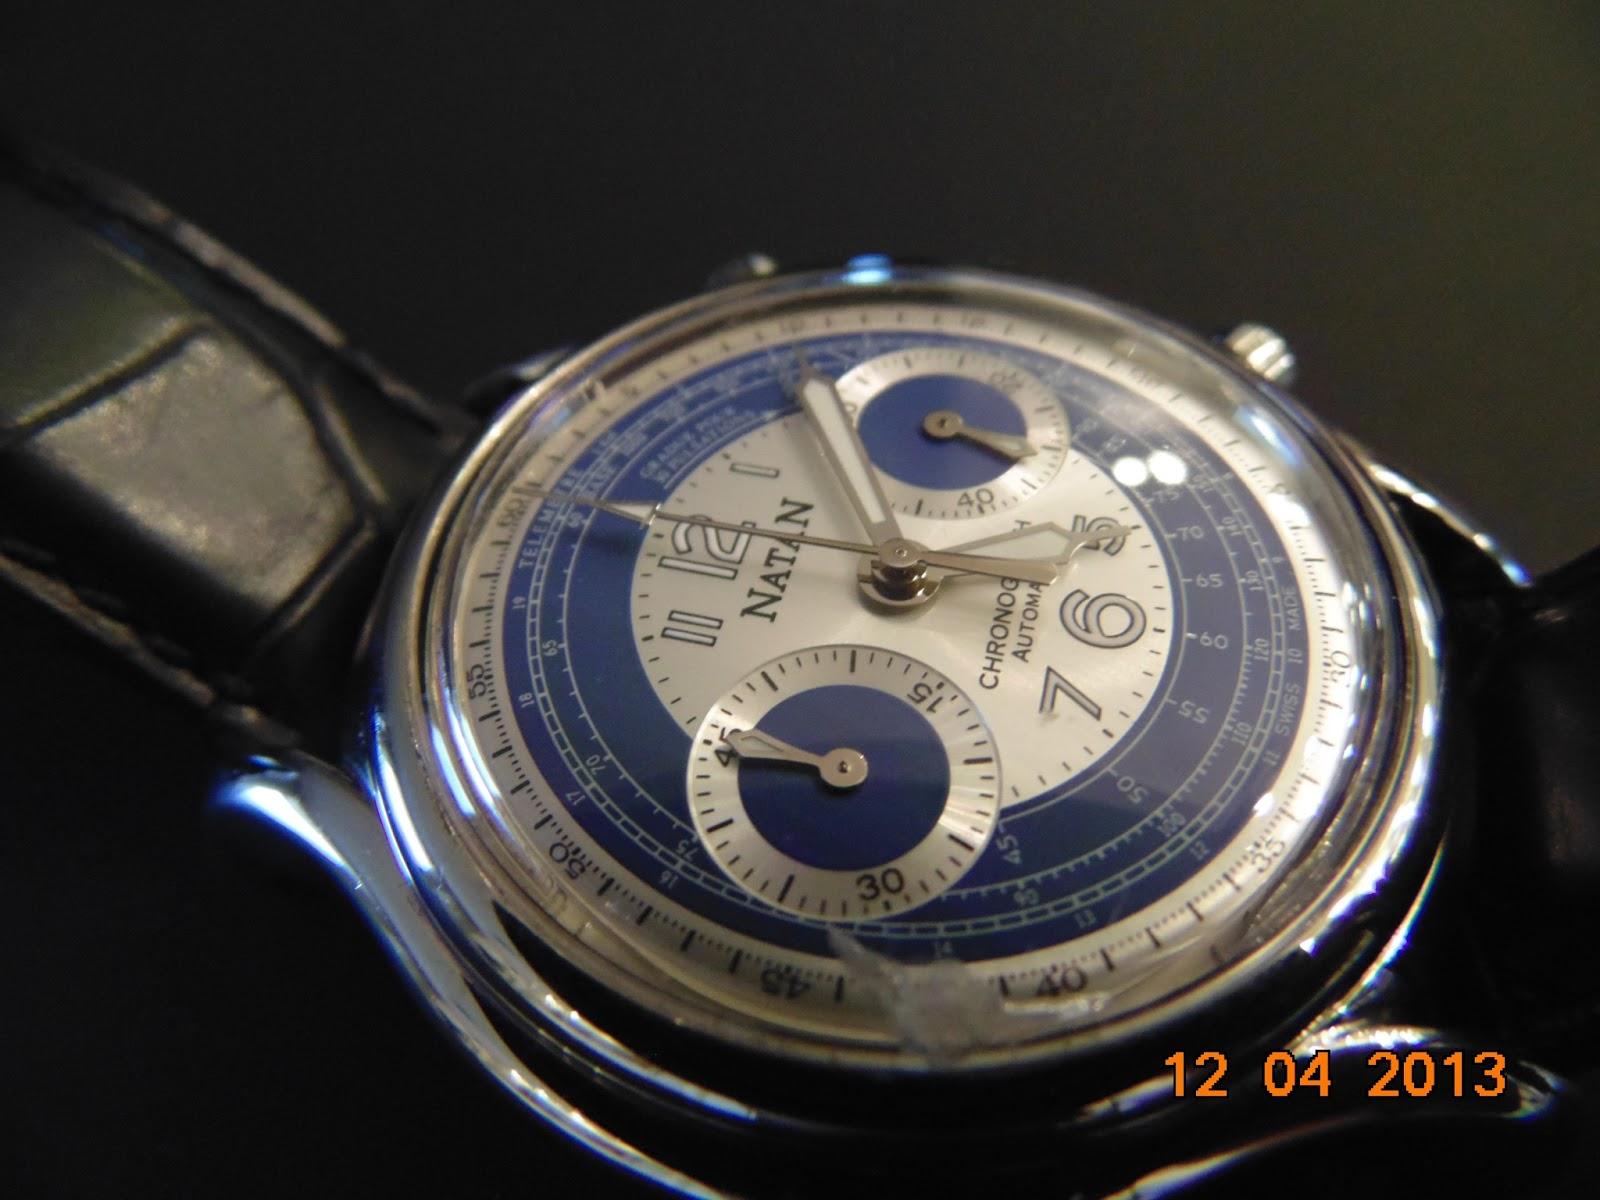 98c6f8960cc Natan Automatic Chronograph. Comprei hoje